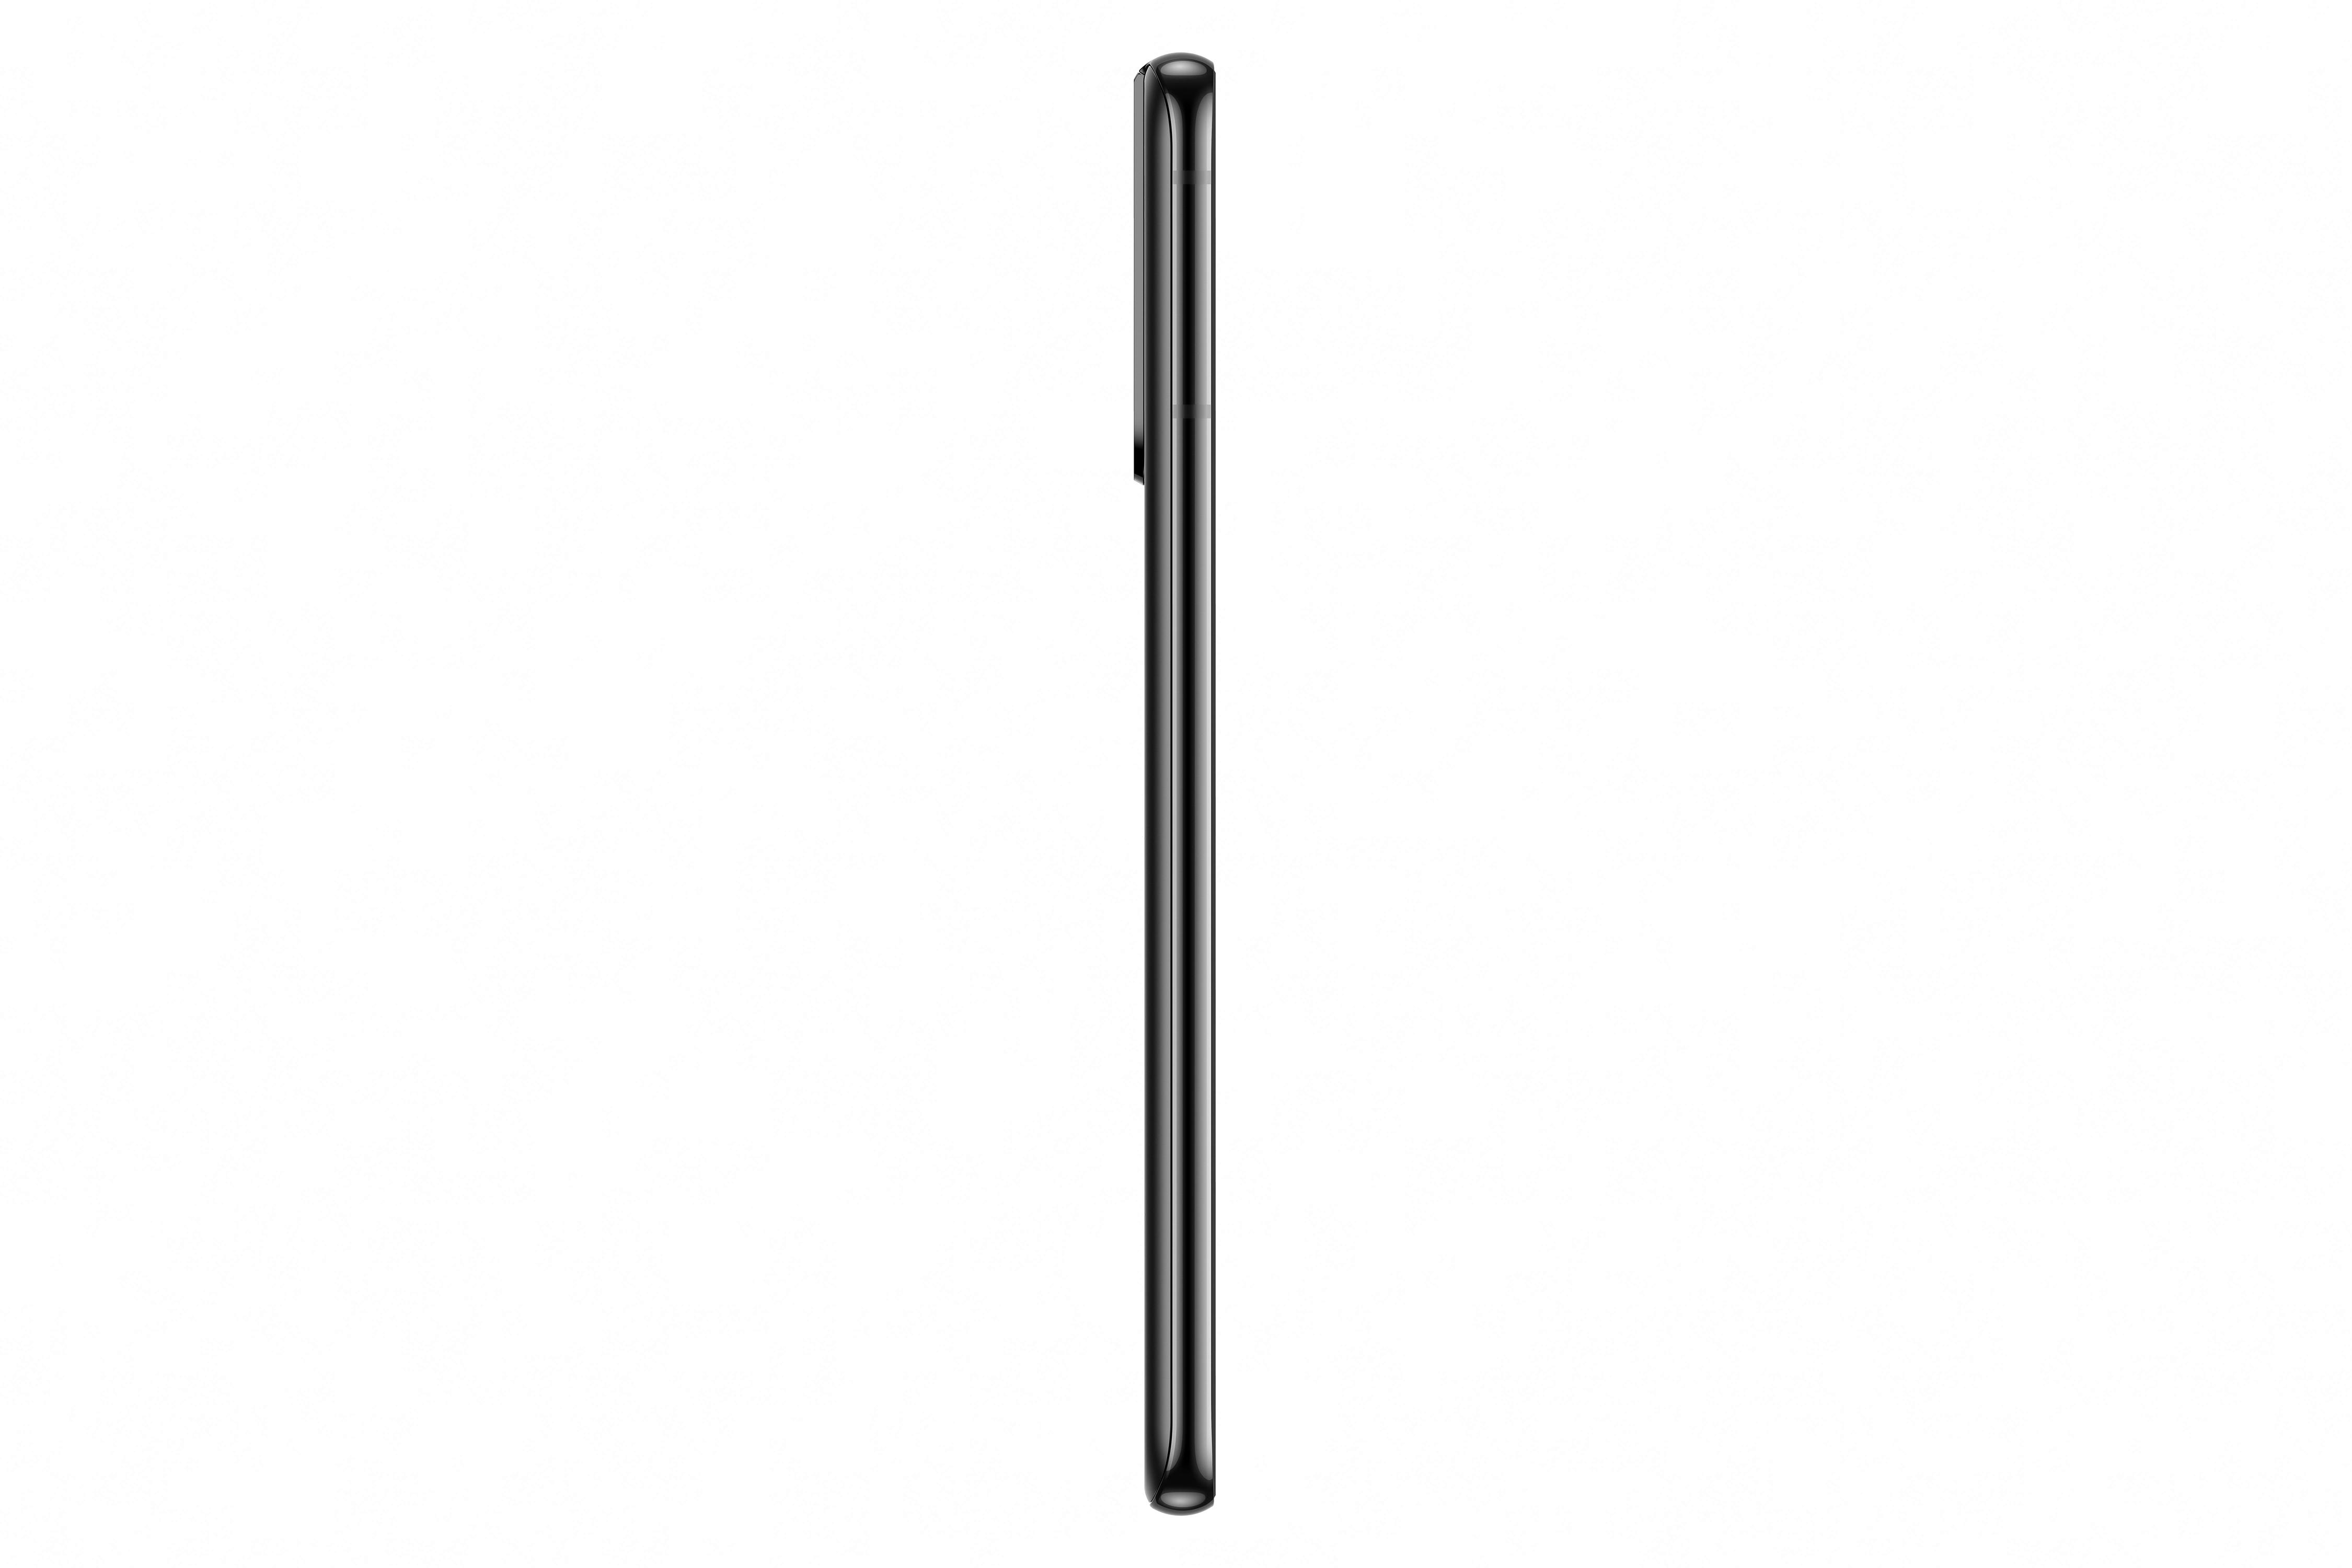 Samsung Galaxy S21+ DUAL (SM-G996B) Black - 5